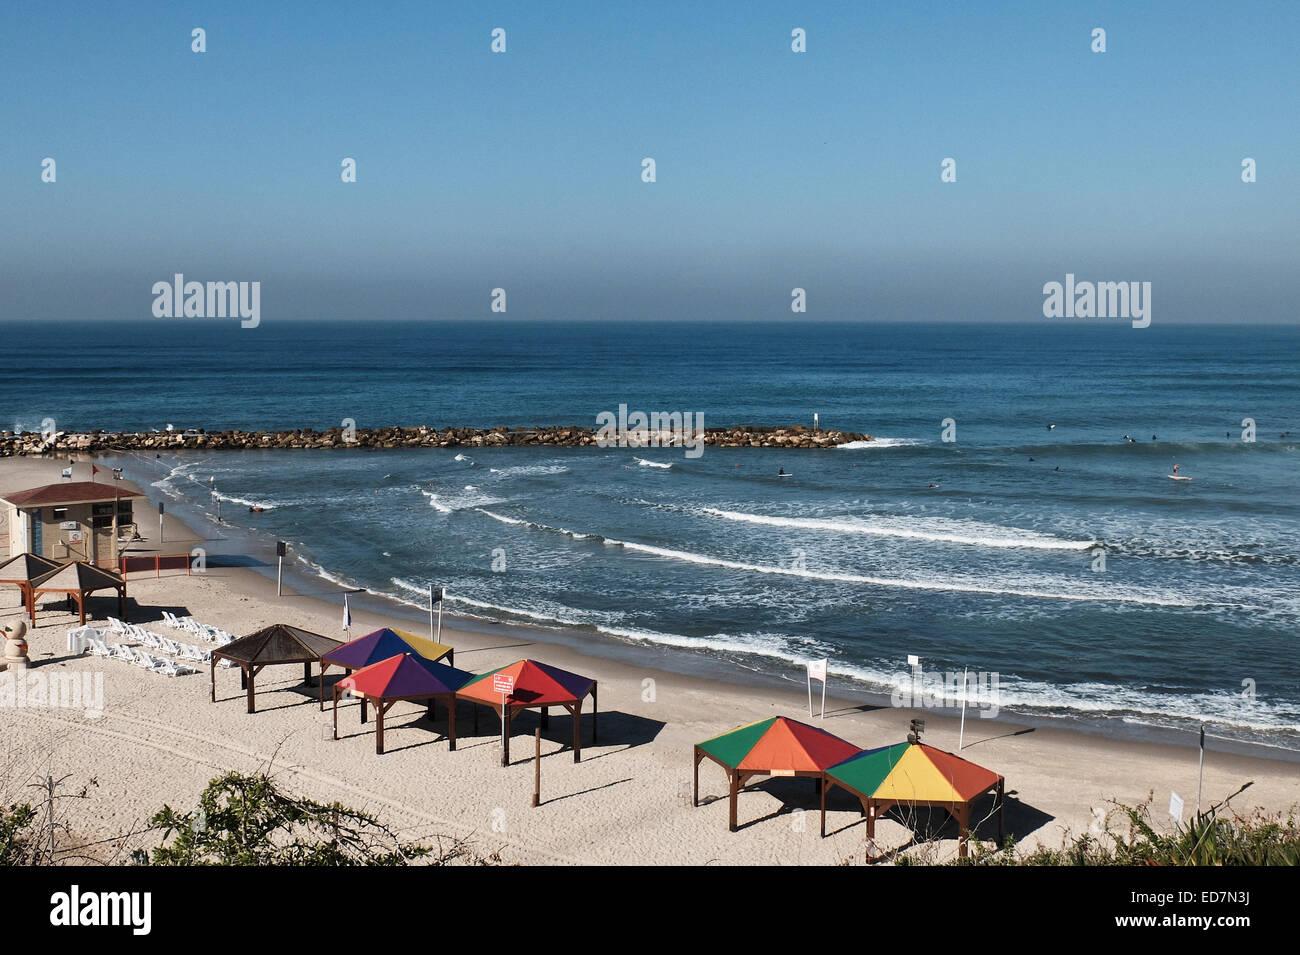 Tel-Aviv, Israel. 31st Dec, 2014. Surfers hit the Hilton Beach enjoying a sunny winter day. Twenty-two Degrees Centigrade - Stock Image